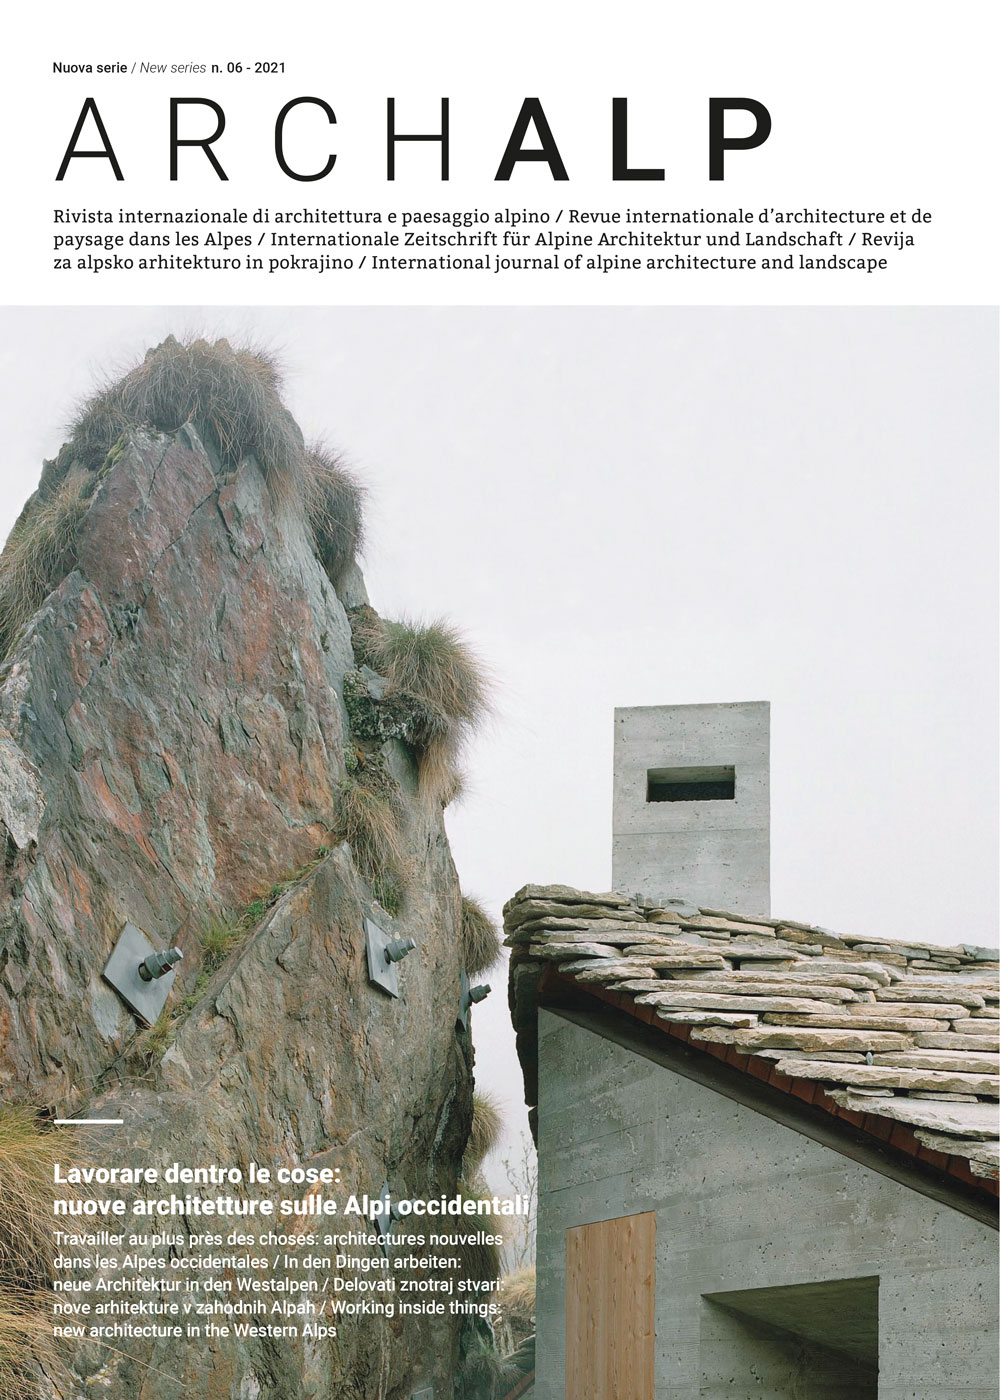 ArchAlp n. 06 - 2021 - Bononia University Press